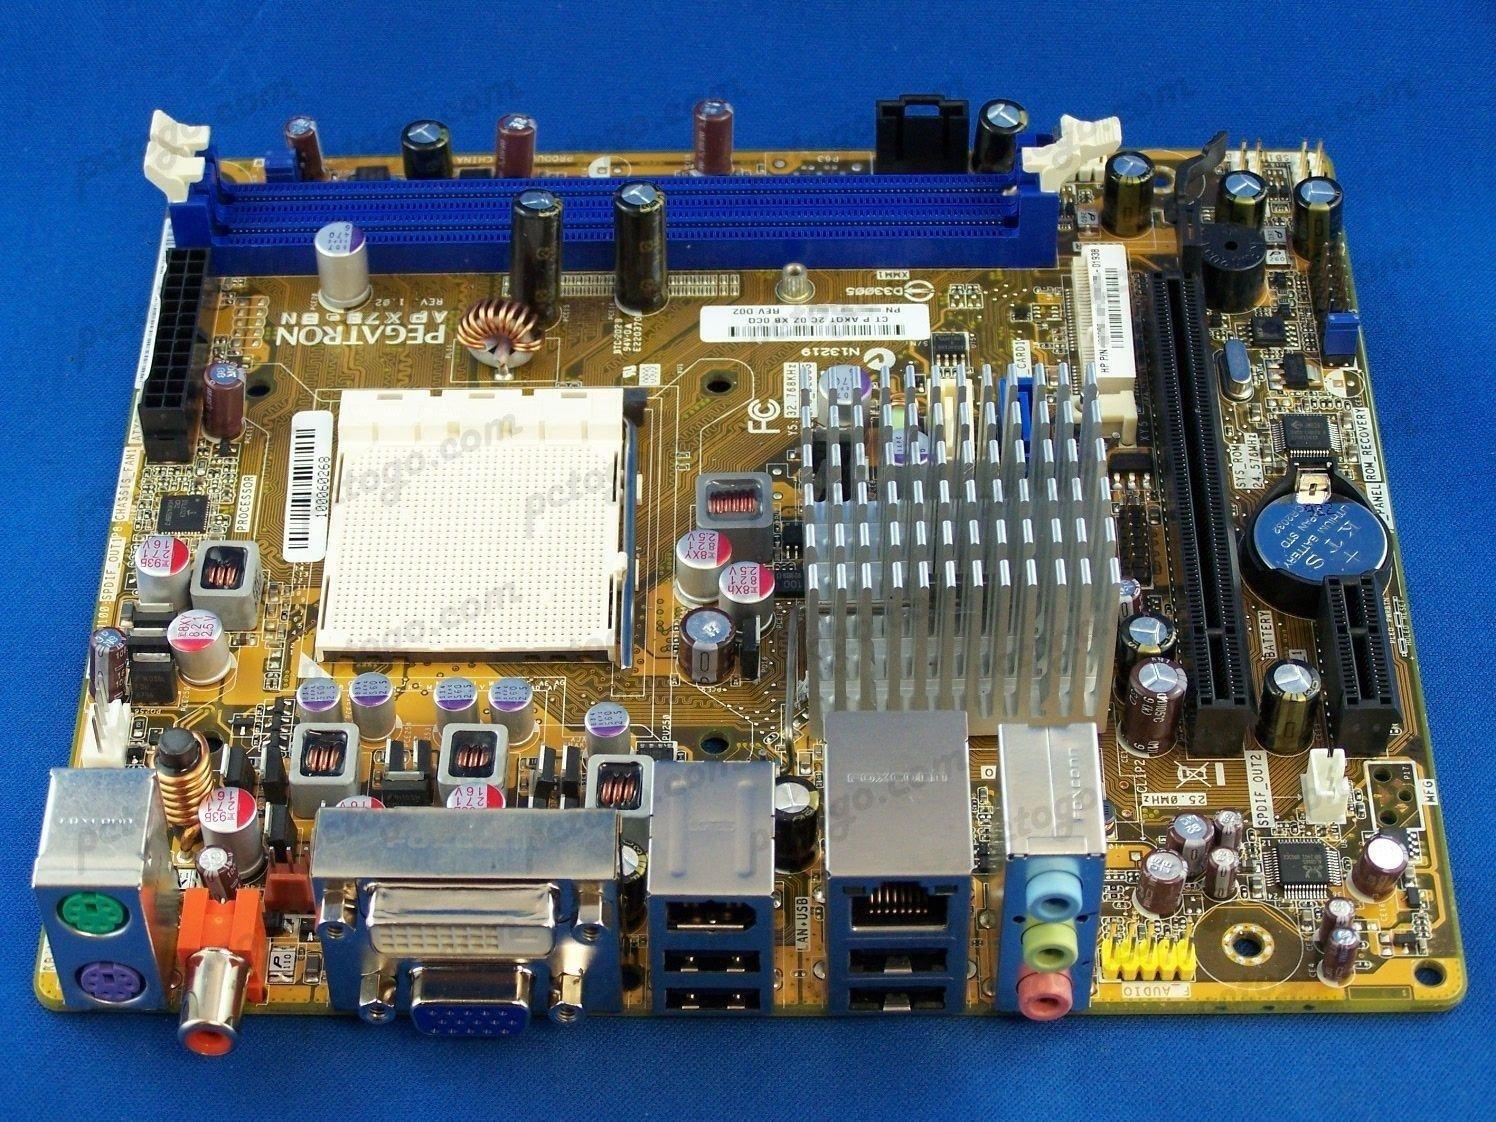 USB 2.0 Wireless WiFi Lan Card for HP-Compaq Pavilion Slimline S5270sc